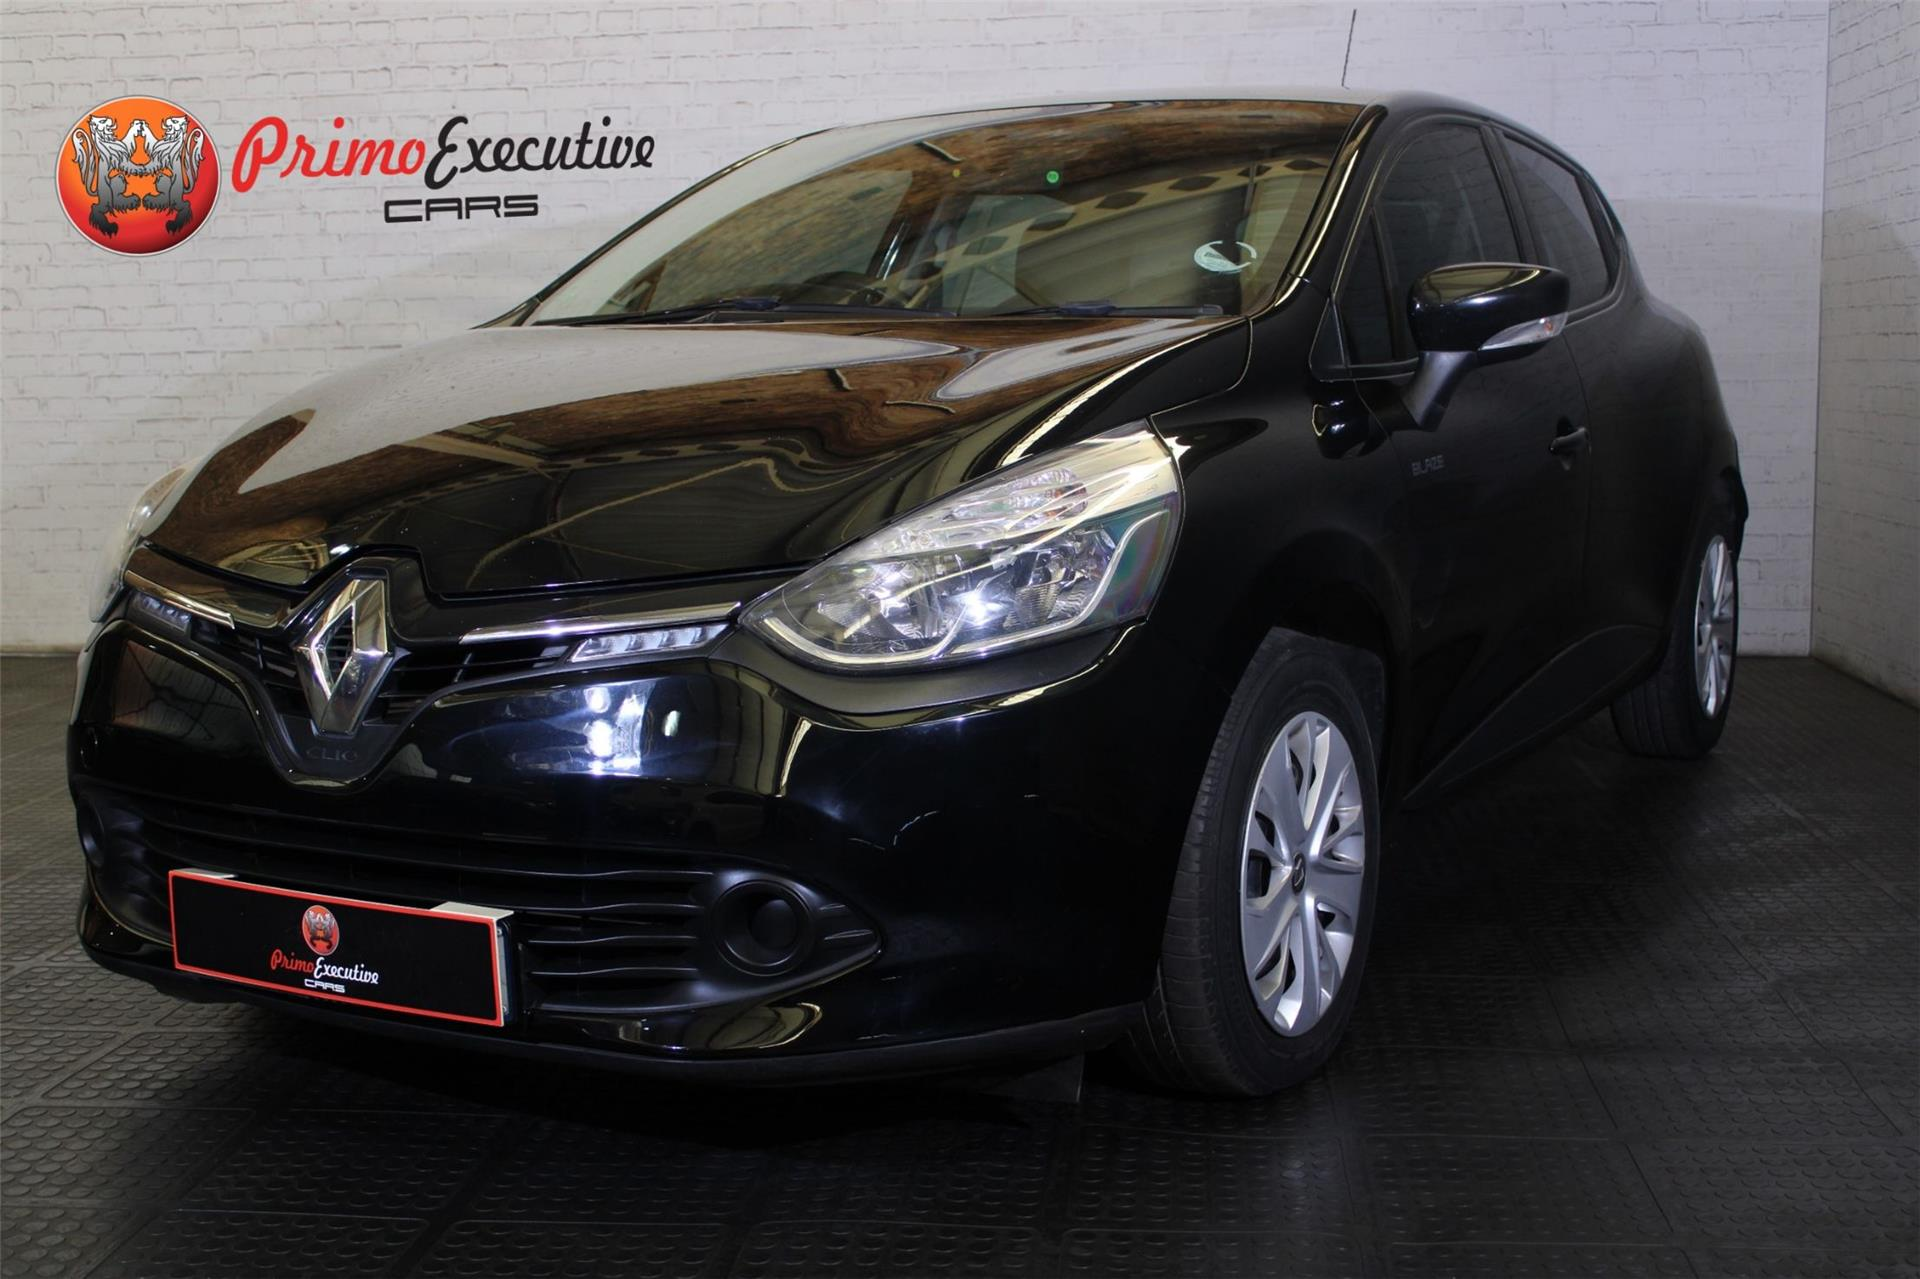 Renault Clio 66kW turbo Blaze